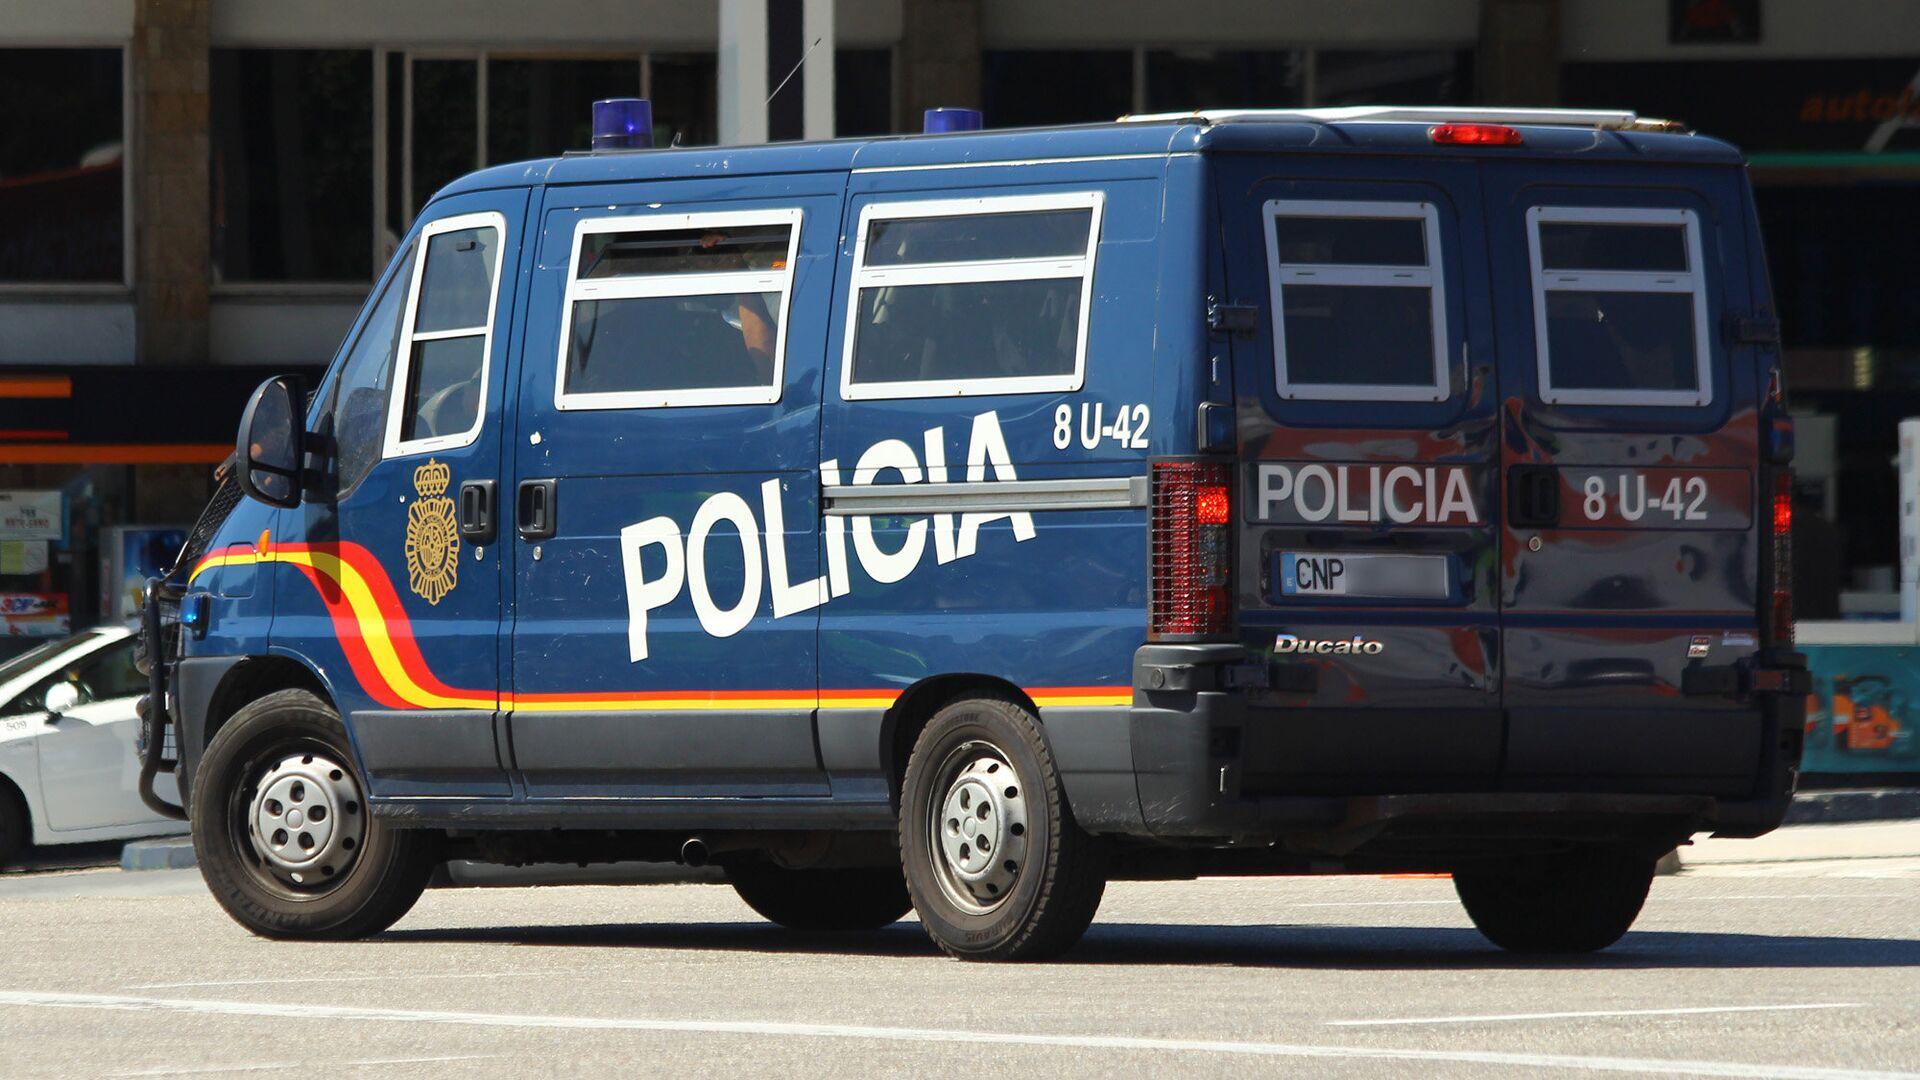 Policía Nacional de España (archivo) - Sputnik Mundo, 1920, 13.04.2021